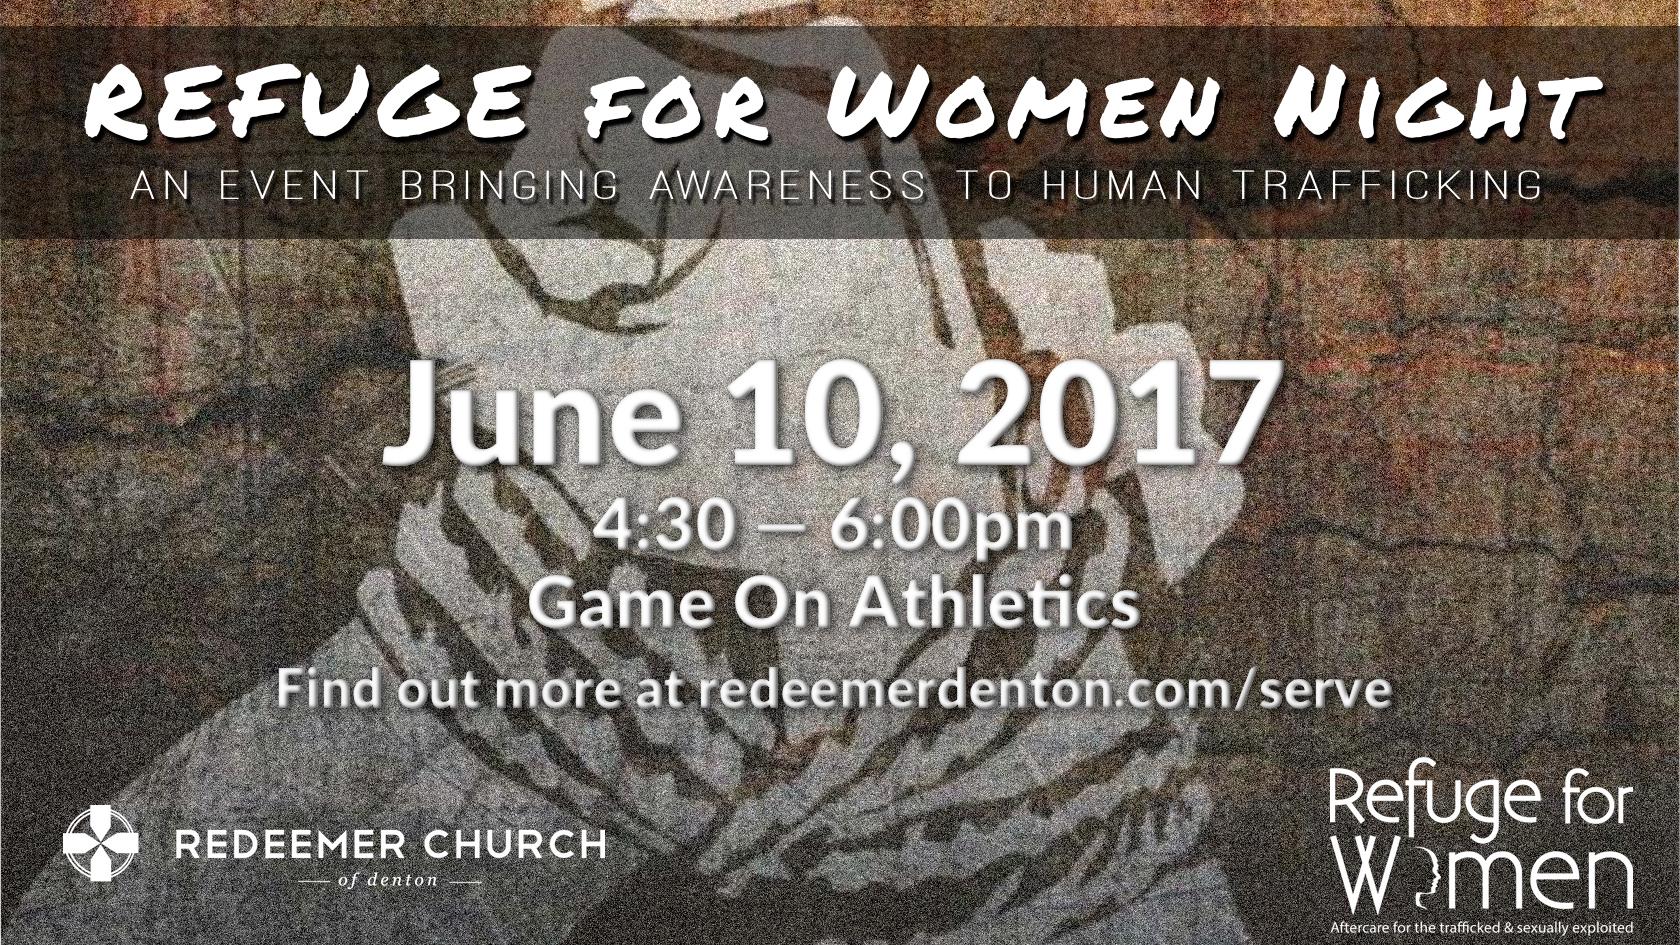 refuge for women human trafficking image